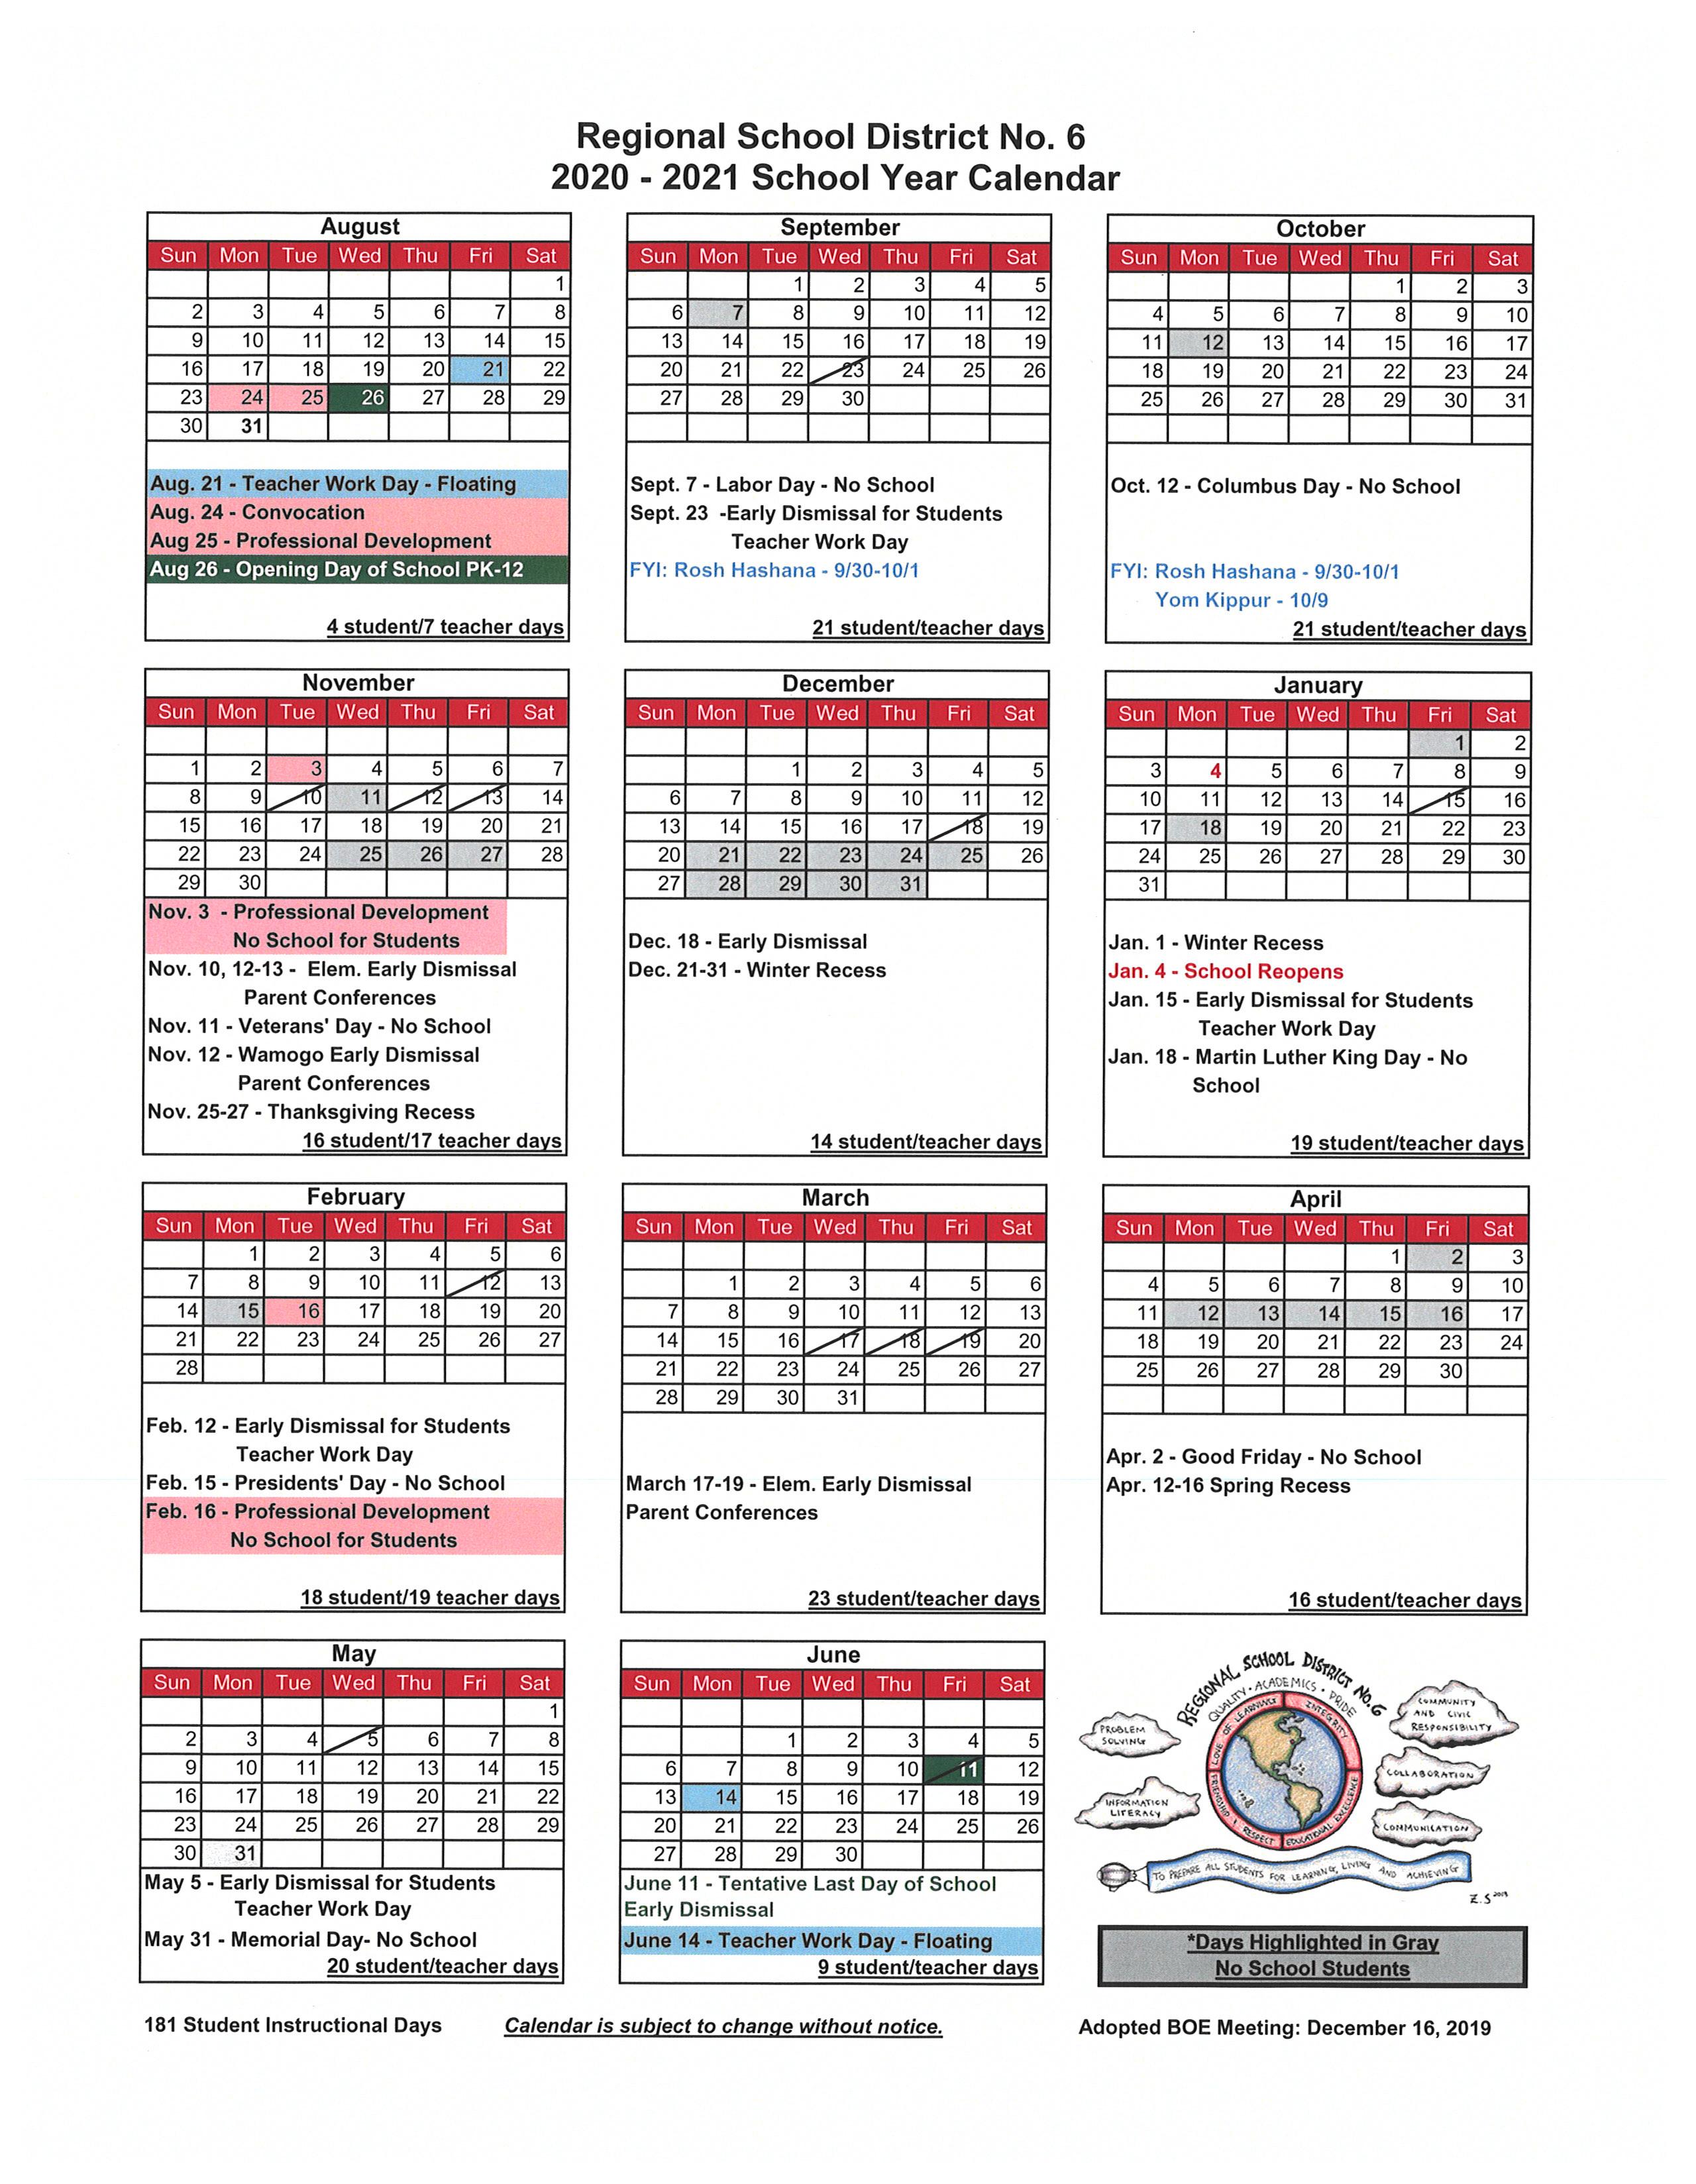 2020 2021 School Calendar - Regional School District No. 6 Inside East Hartford School Calendar 2021 2021